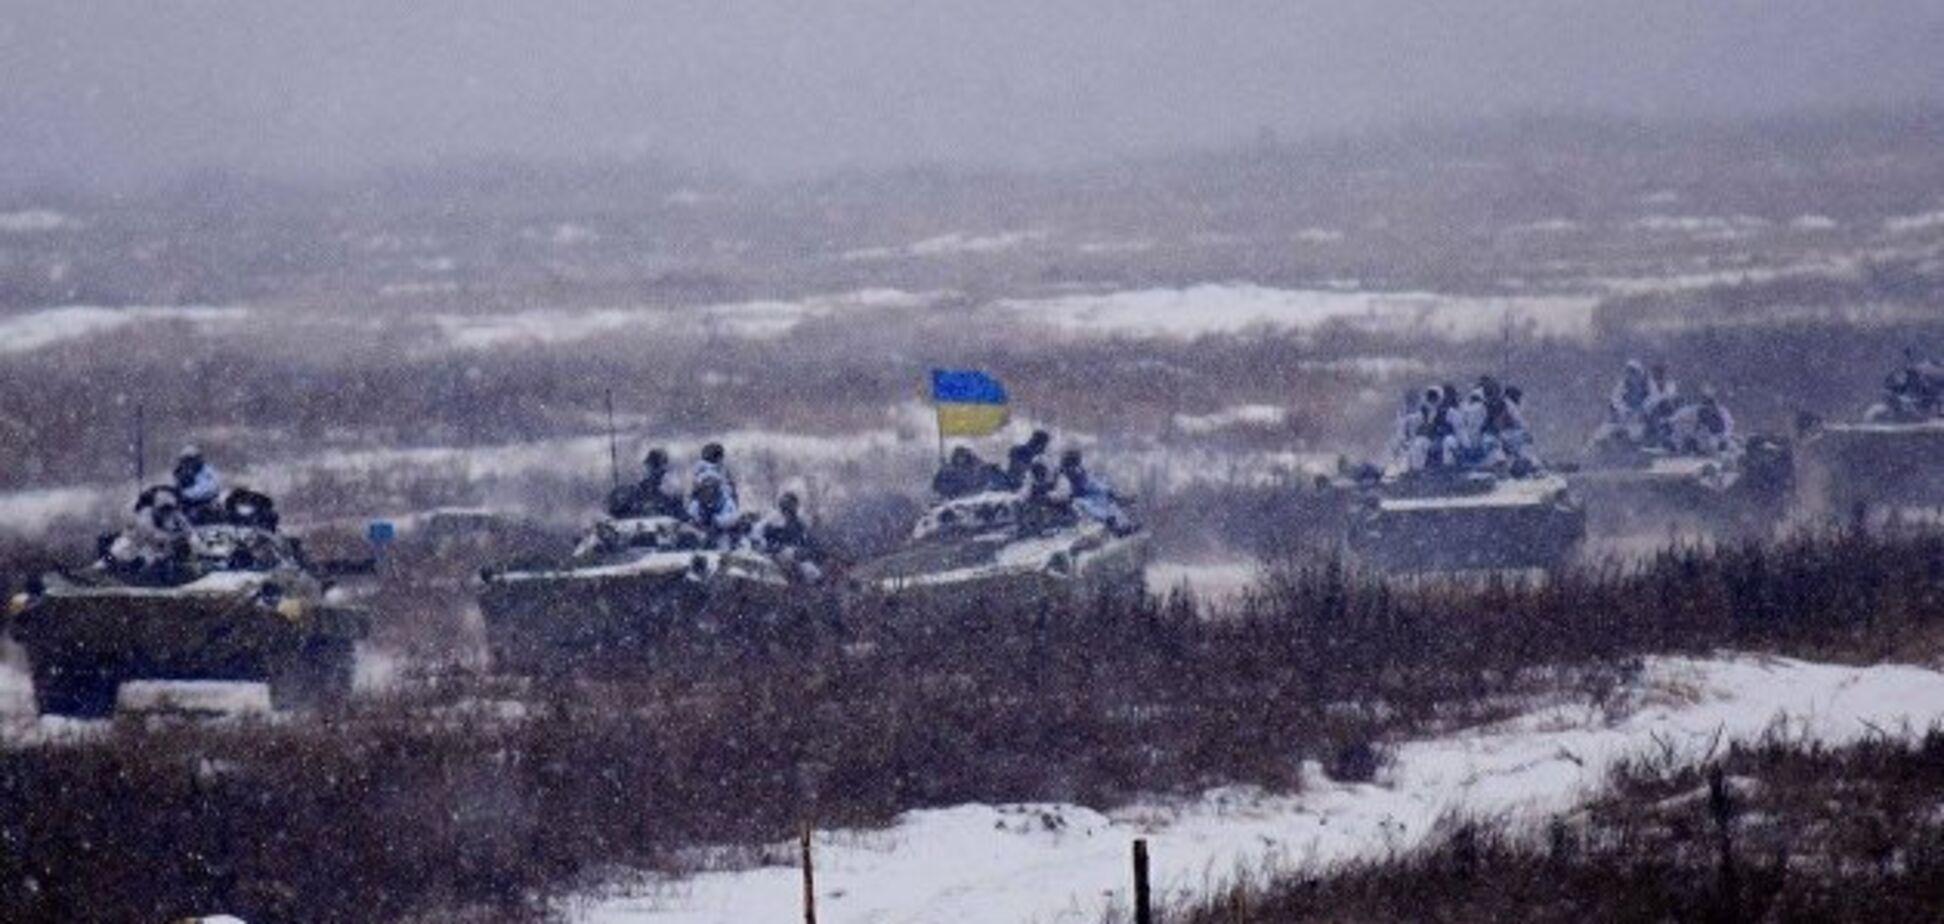 Взяли в плен! Террористы ''ДНР'' эпично опозорились при атаке на ВСУ